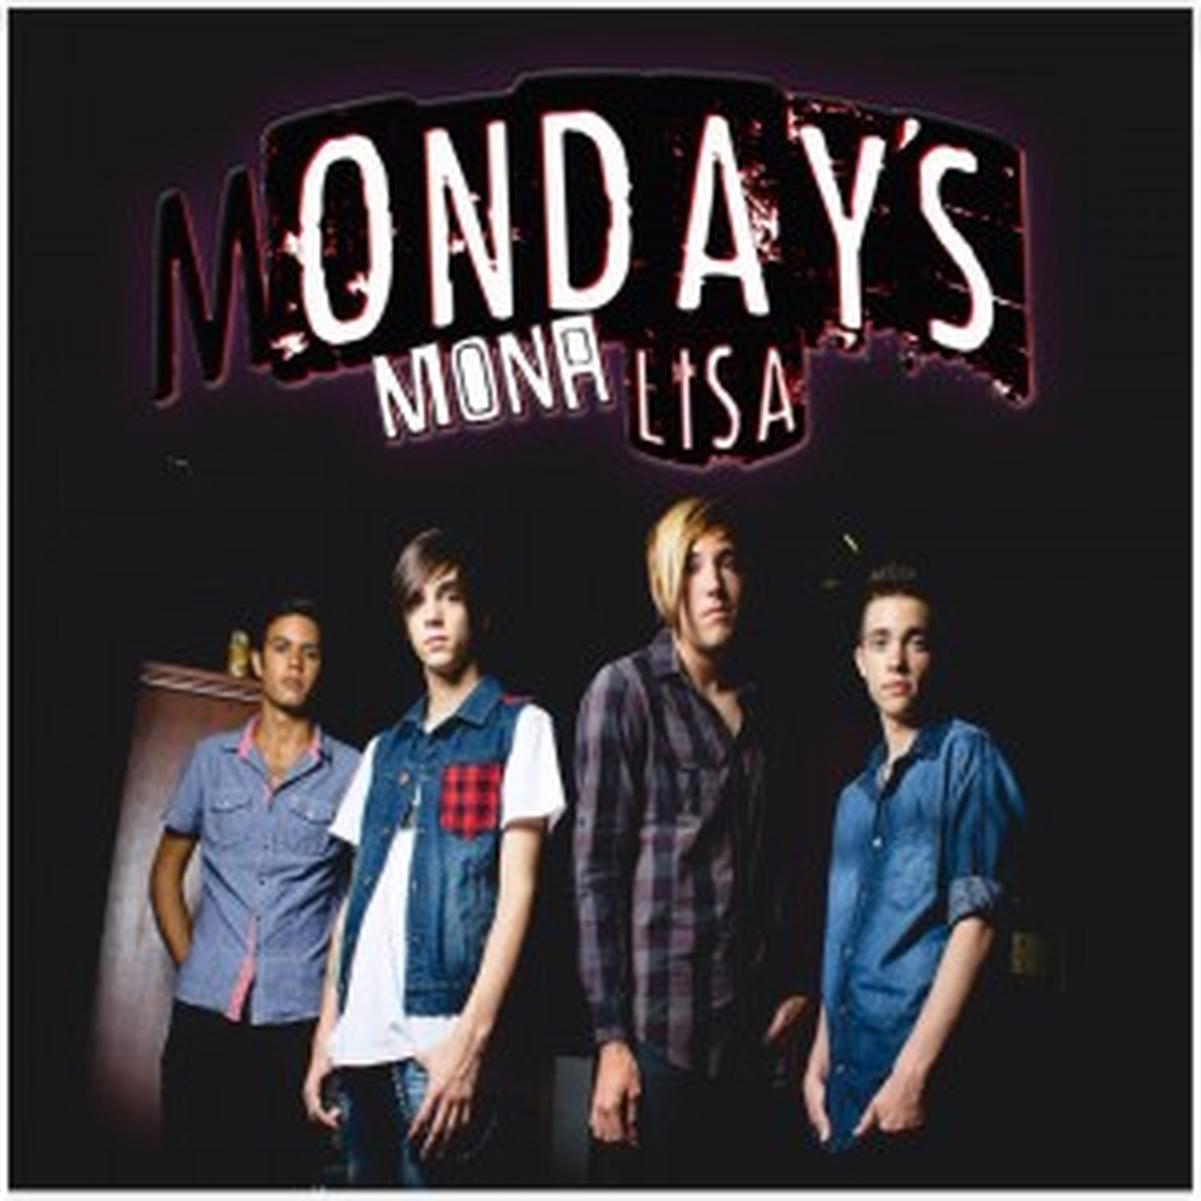 Monday's Mona LIsa